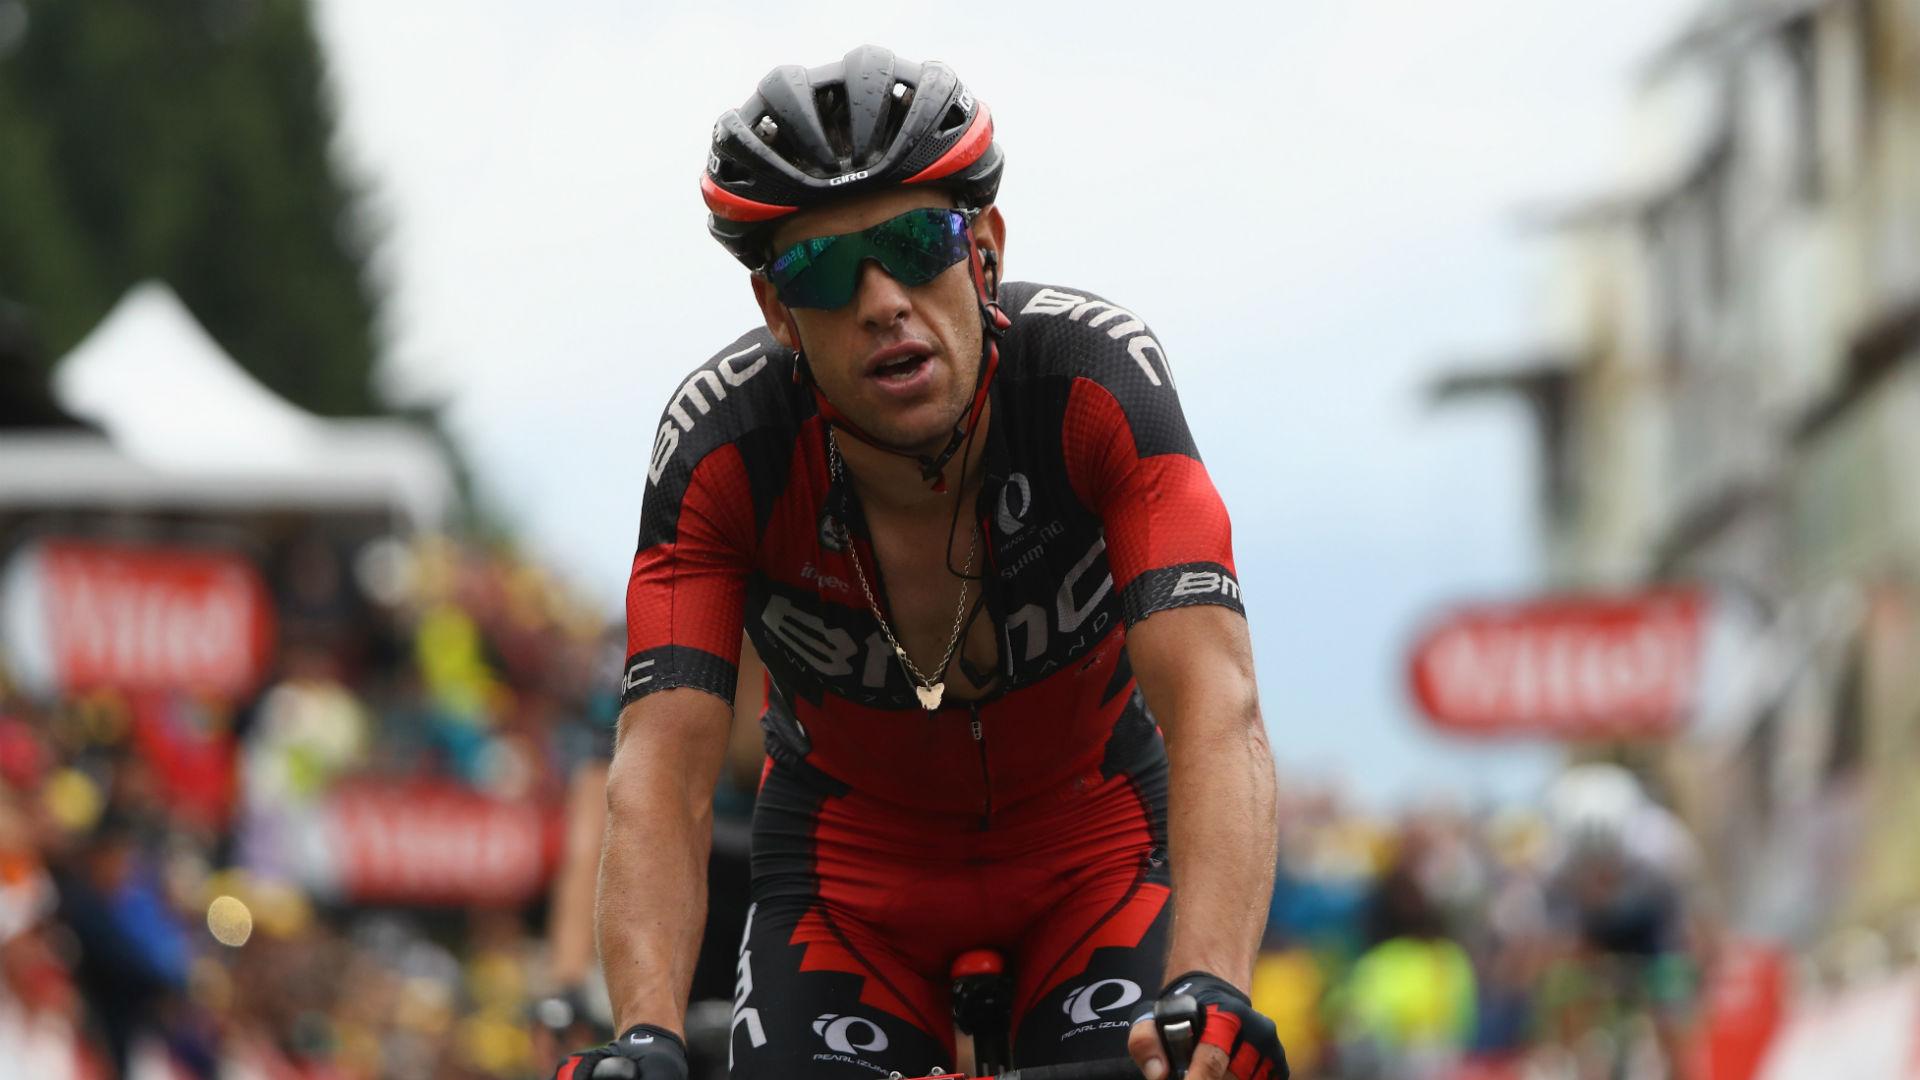 BMC Racing lead rider Richie Porte